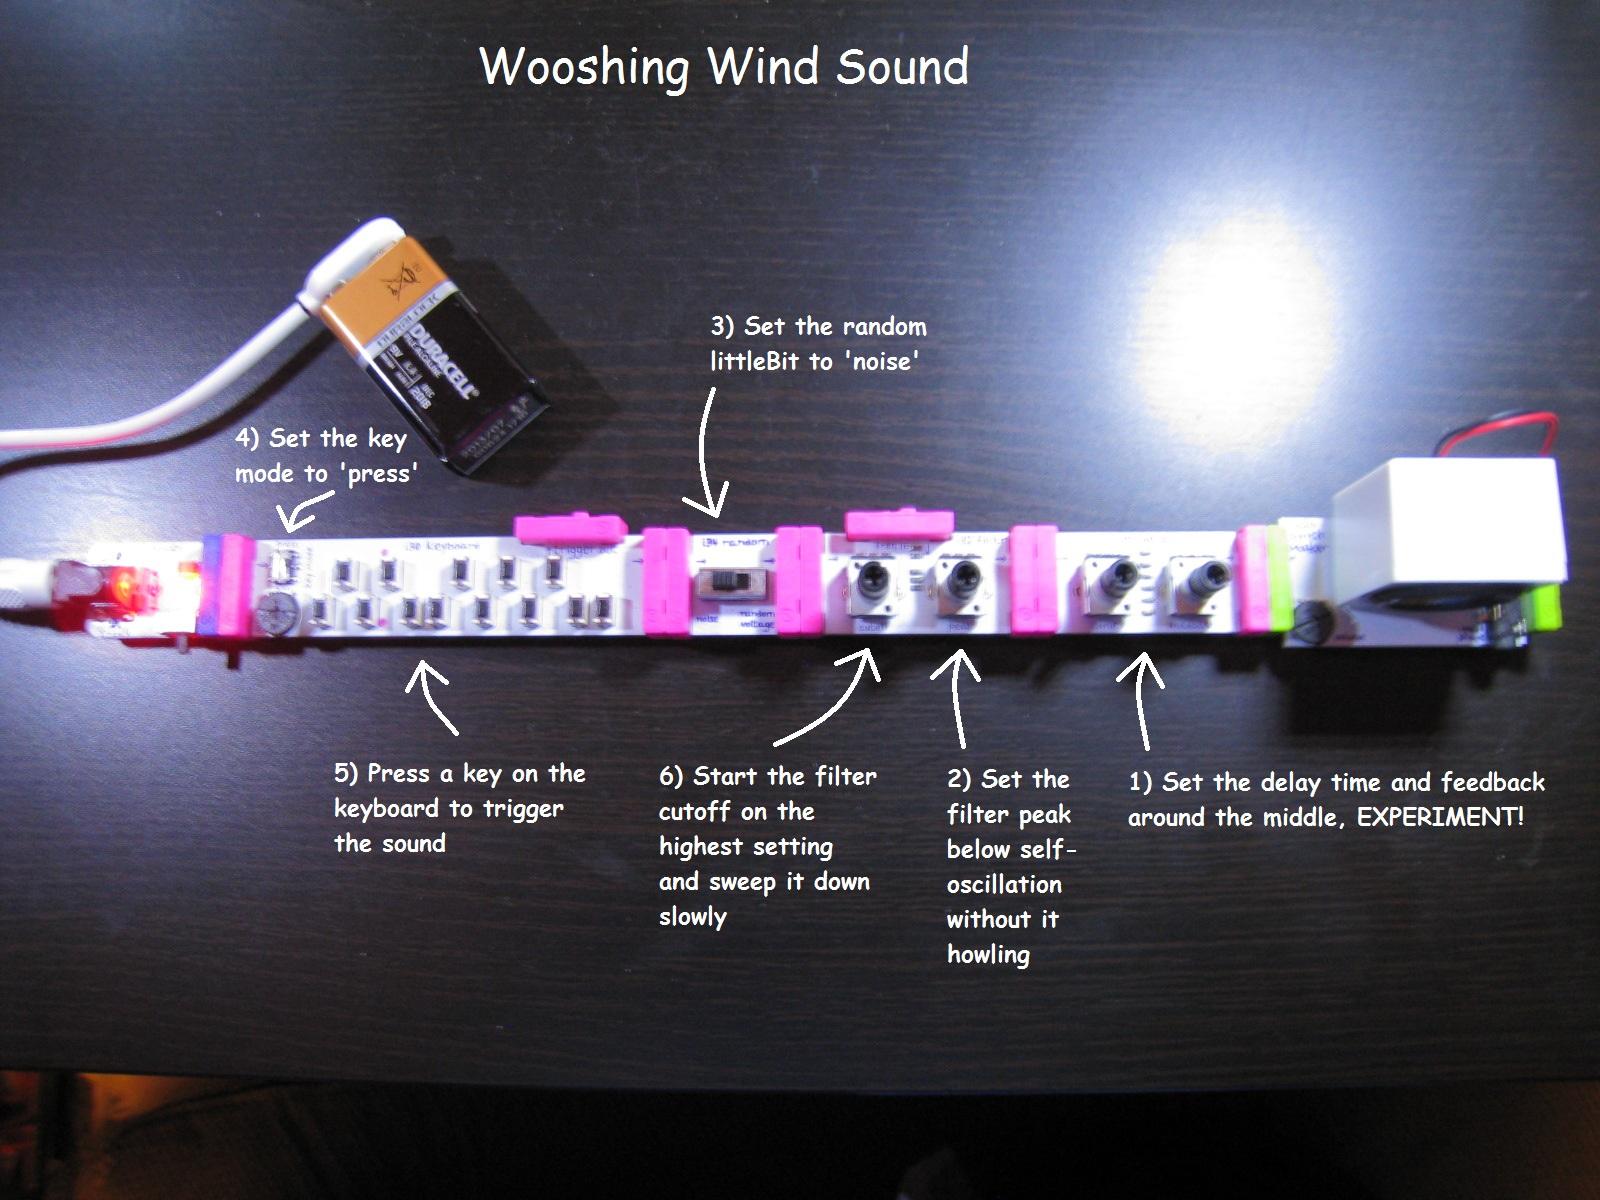 Wooshing wind sound